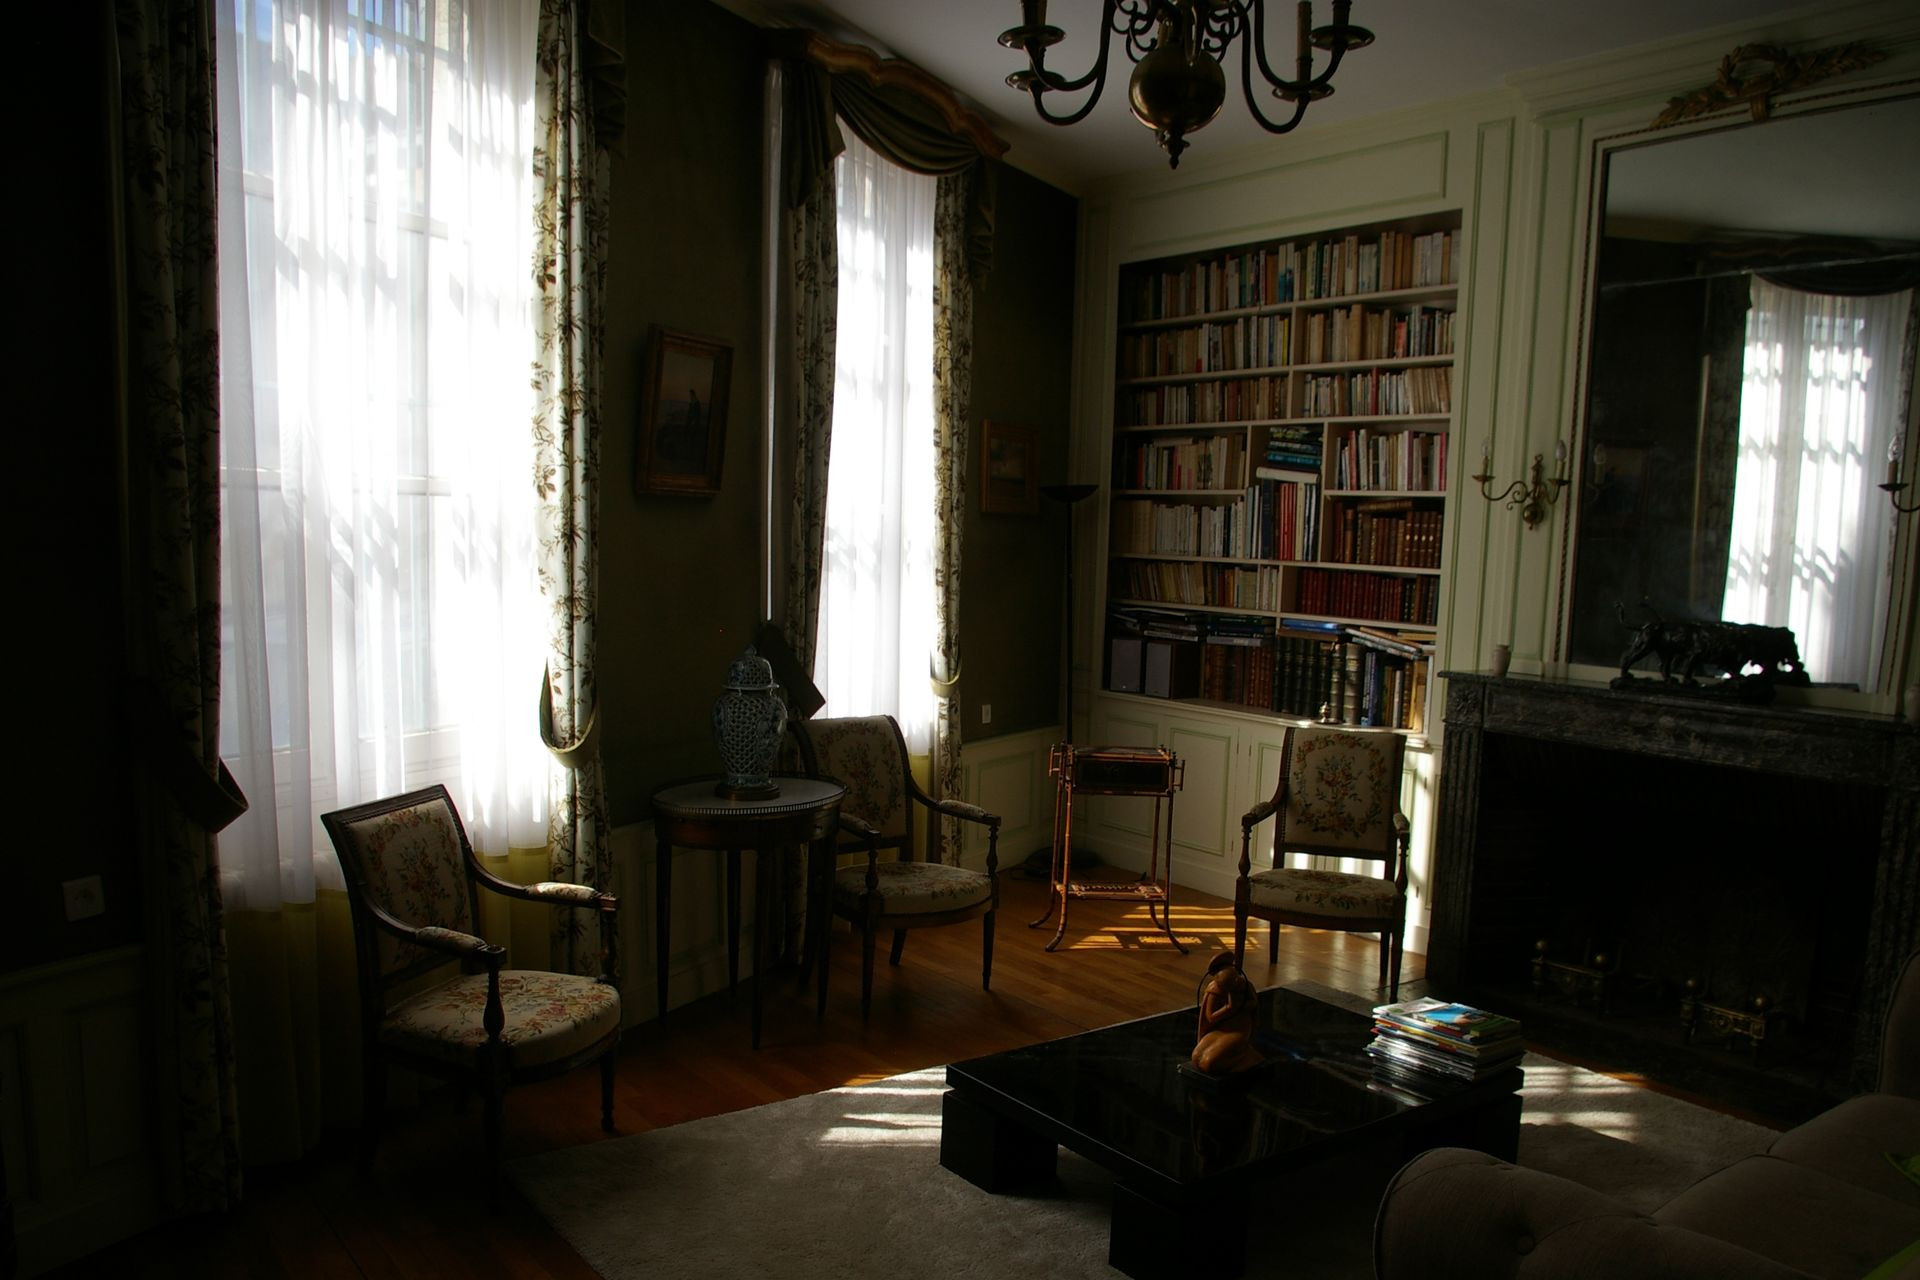 koop 39 chambre d 39 hotes goede verdienste in centrum auxerre 39 in bourgogne yonne in frankrijk. Black Bedroom Furniture Sets. Home Design Ideas